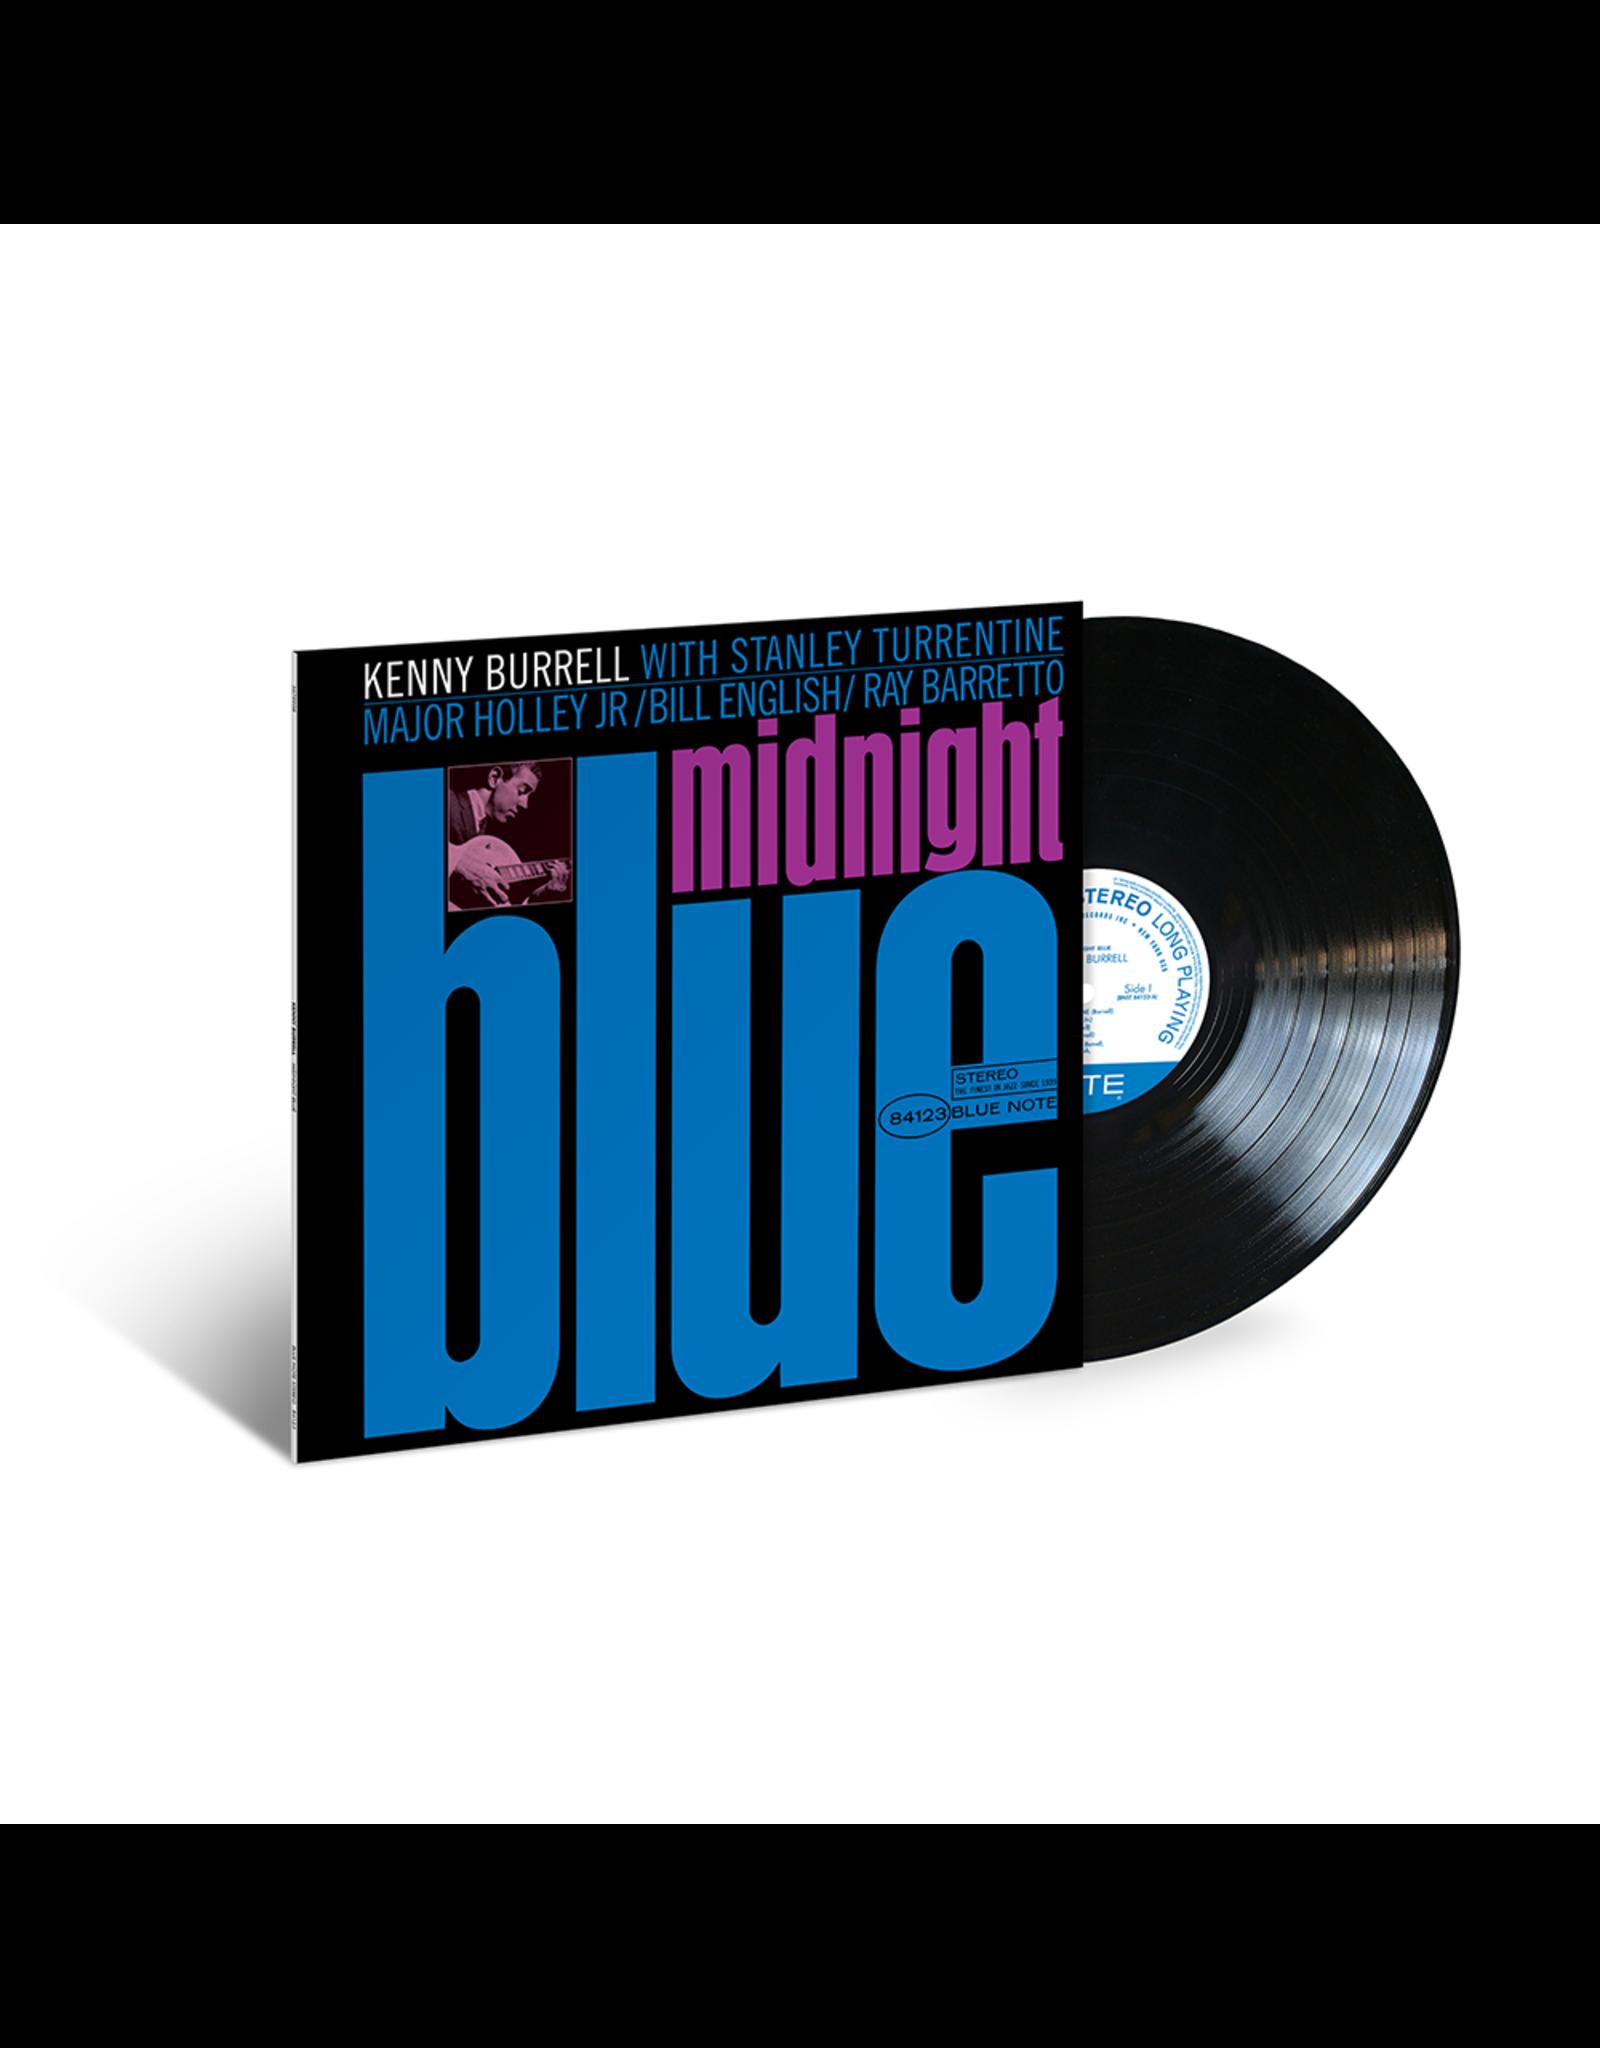 Burrell, Kenny - Midnight Blue LP